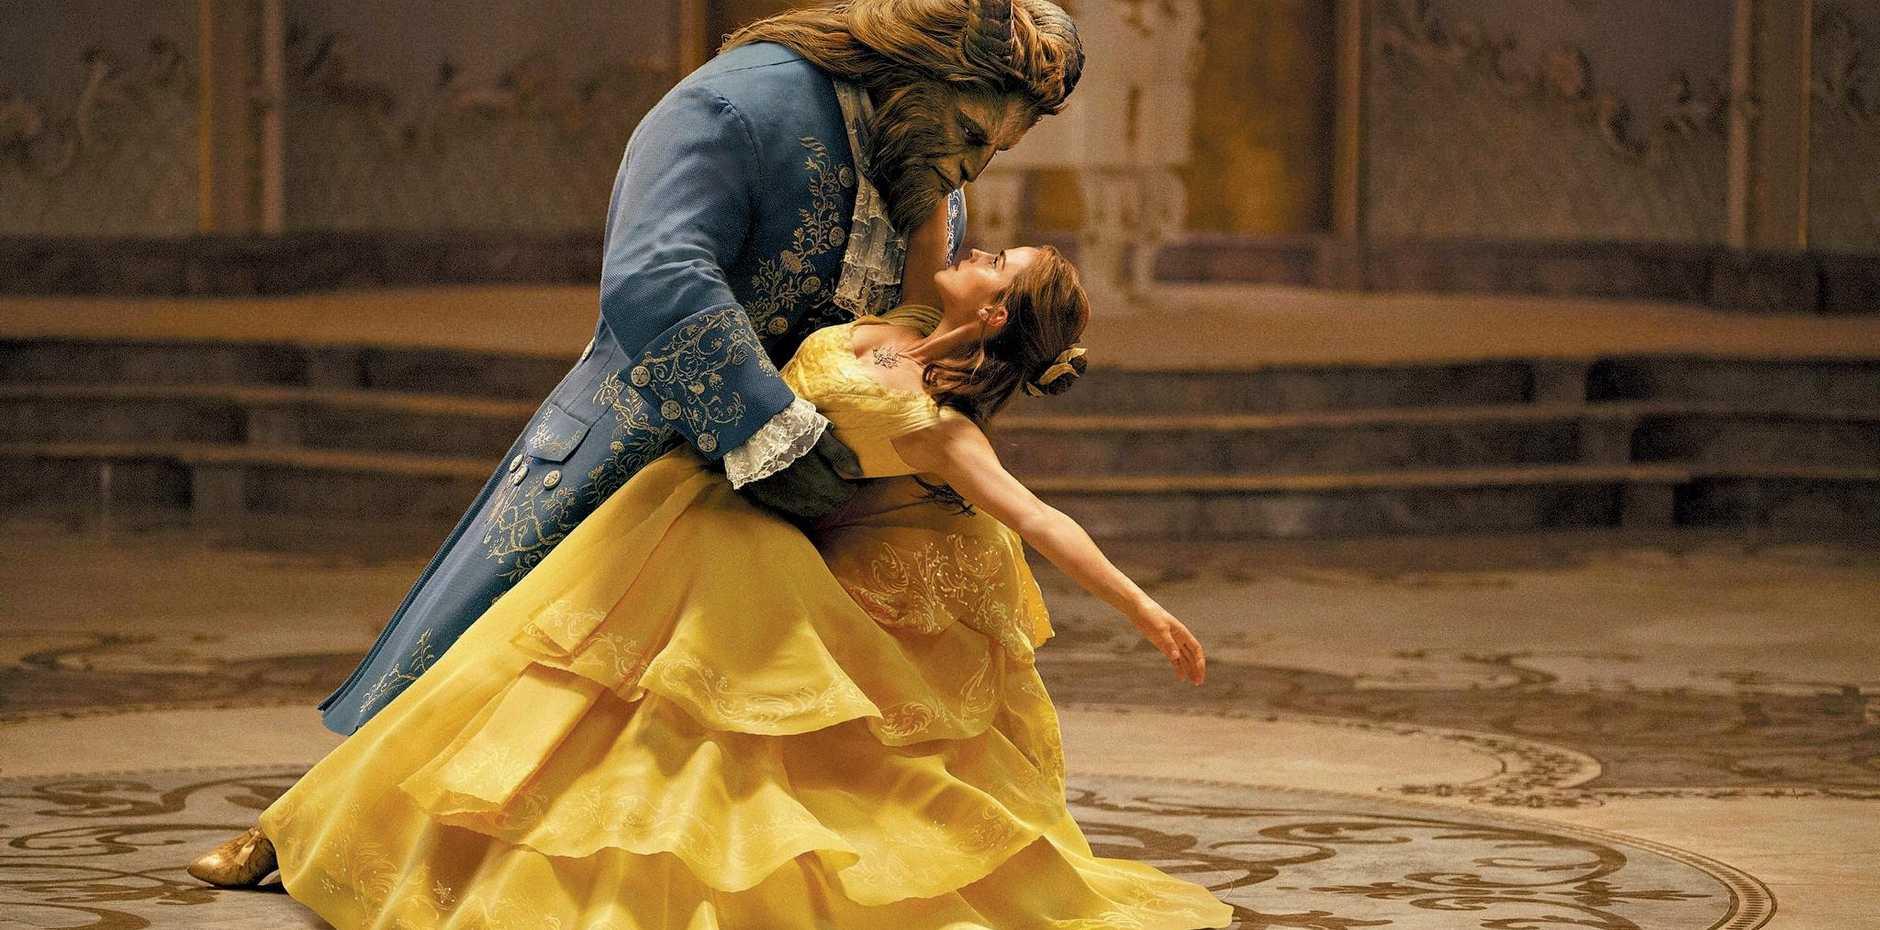 BIG BUCKS: Emma Watson and Dan Stevens star in the movie Beauty and the Beast.